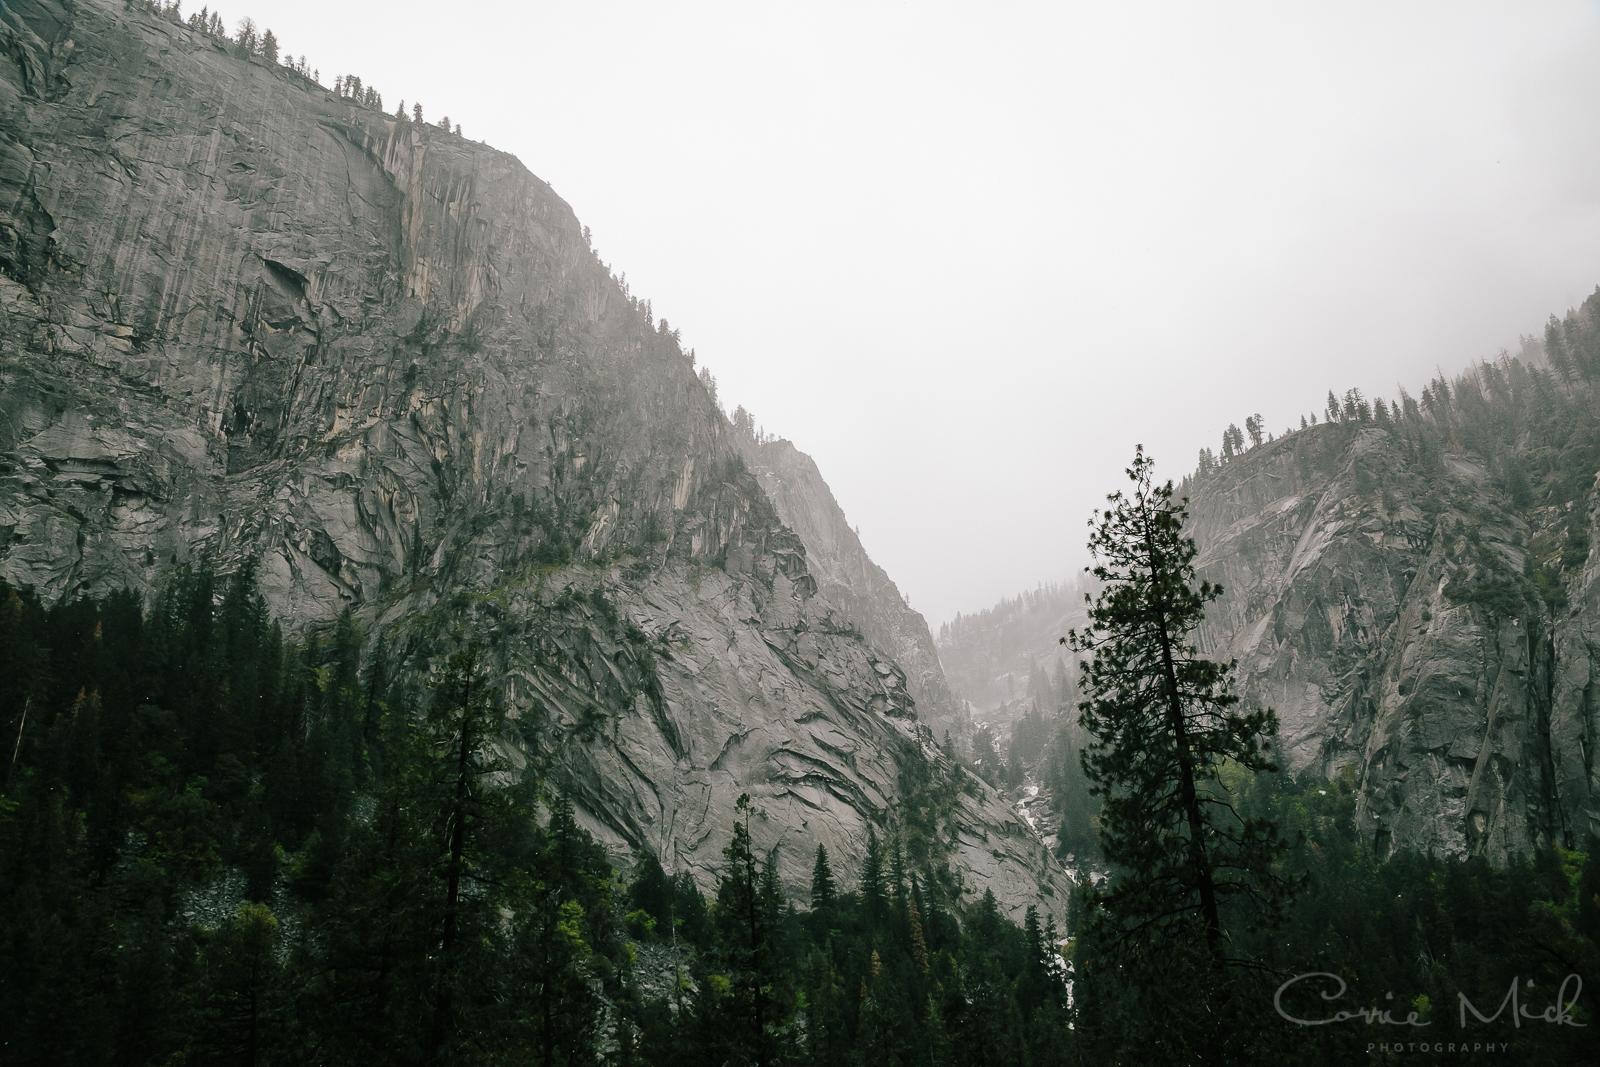 Yosemite April 2016 - Corrie Mick Photography-18.jpg